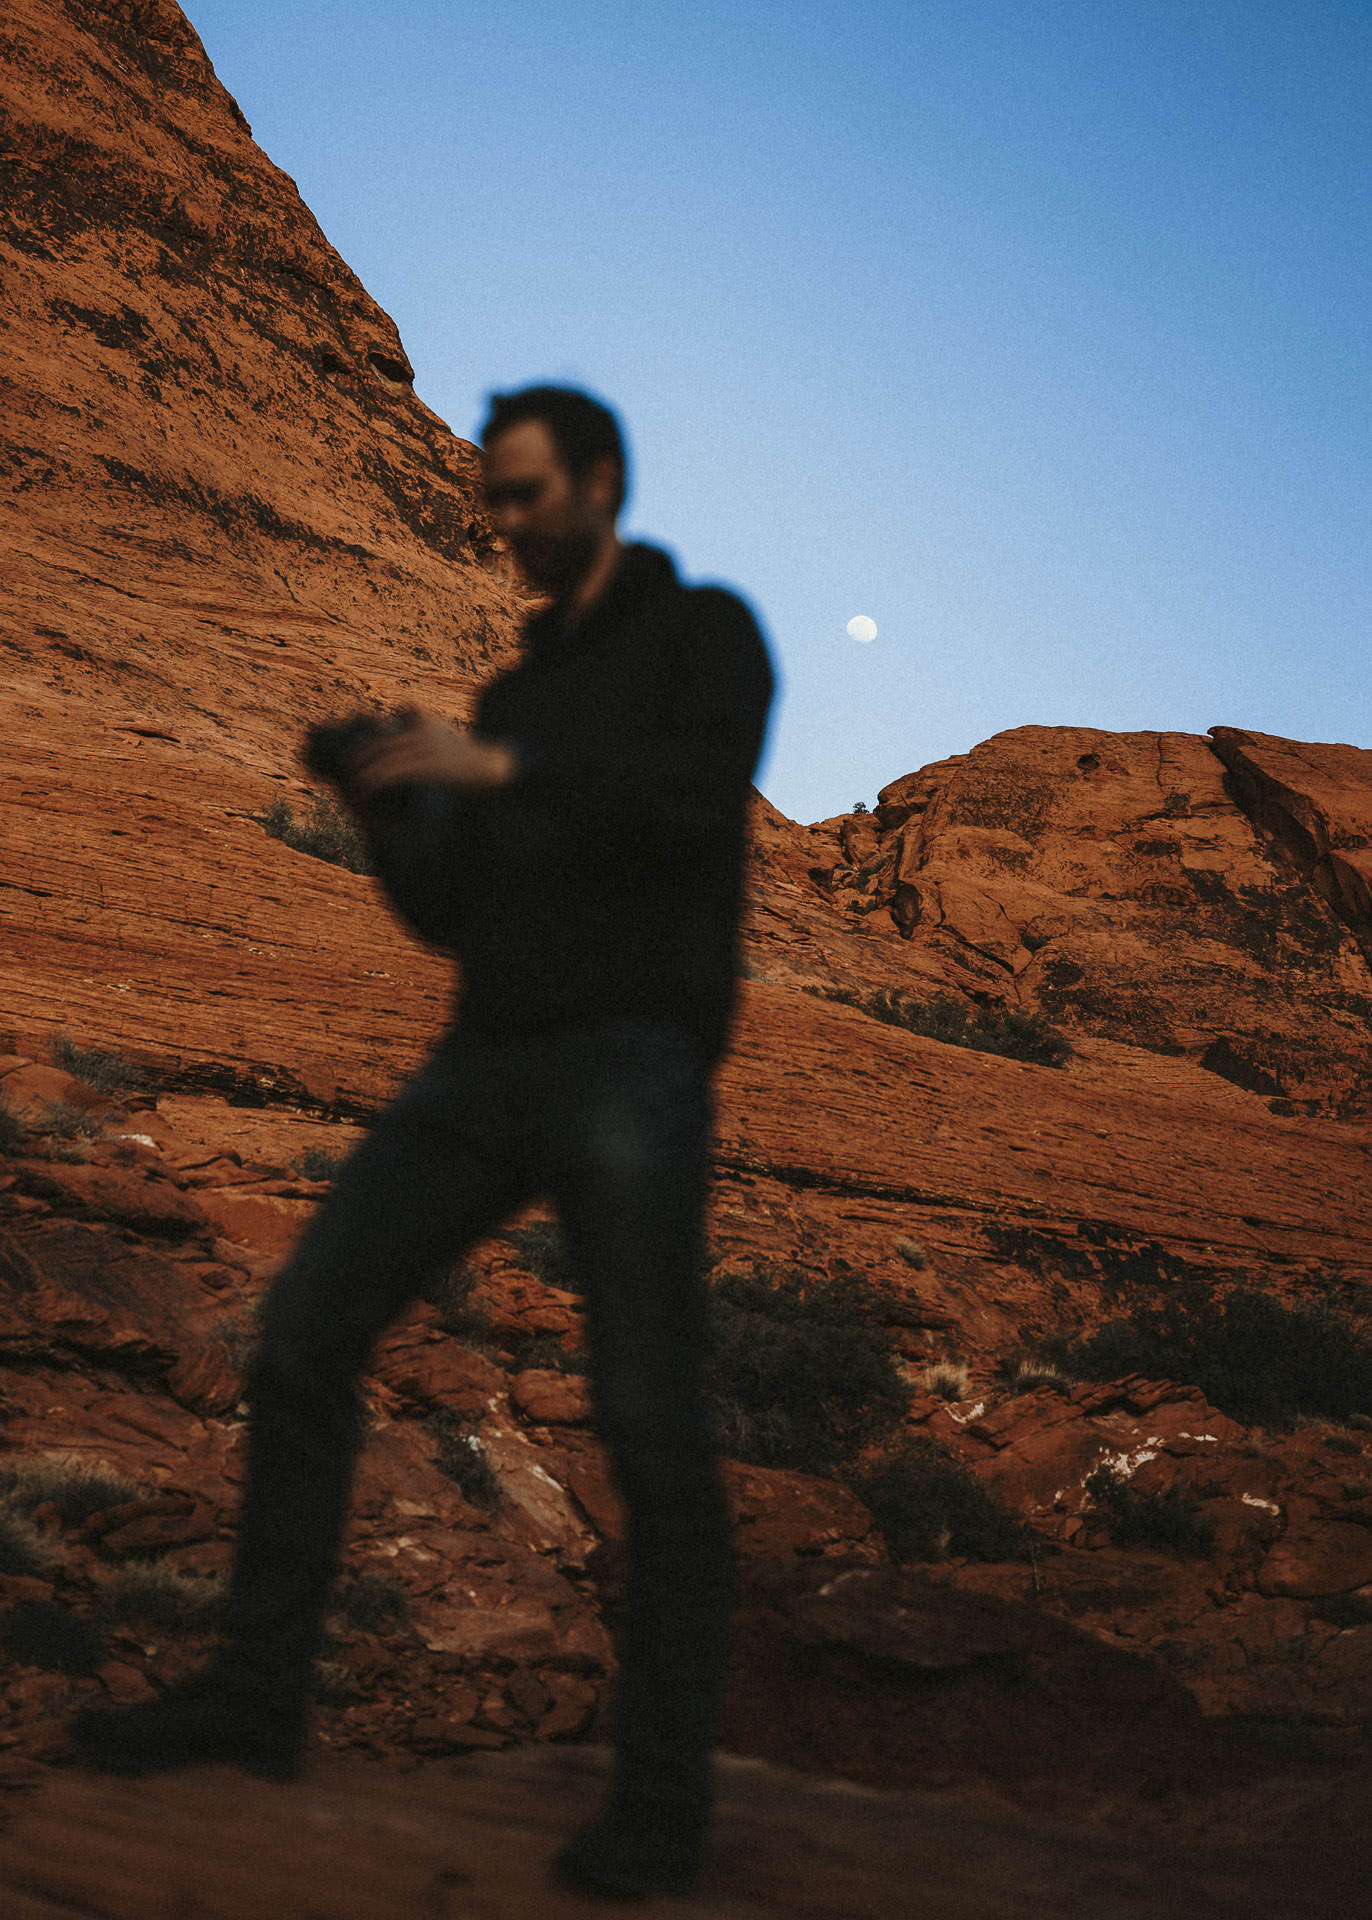 Twisted-oaks-studio-wppi-leica-red-rock-canyon-0009.jpg